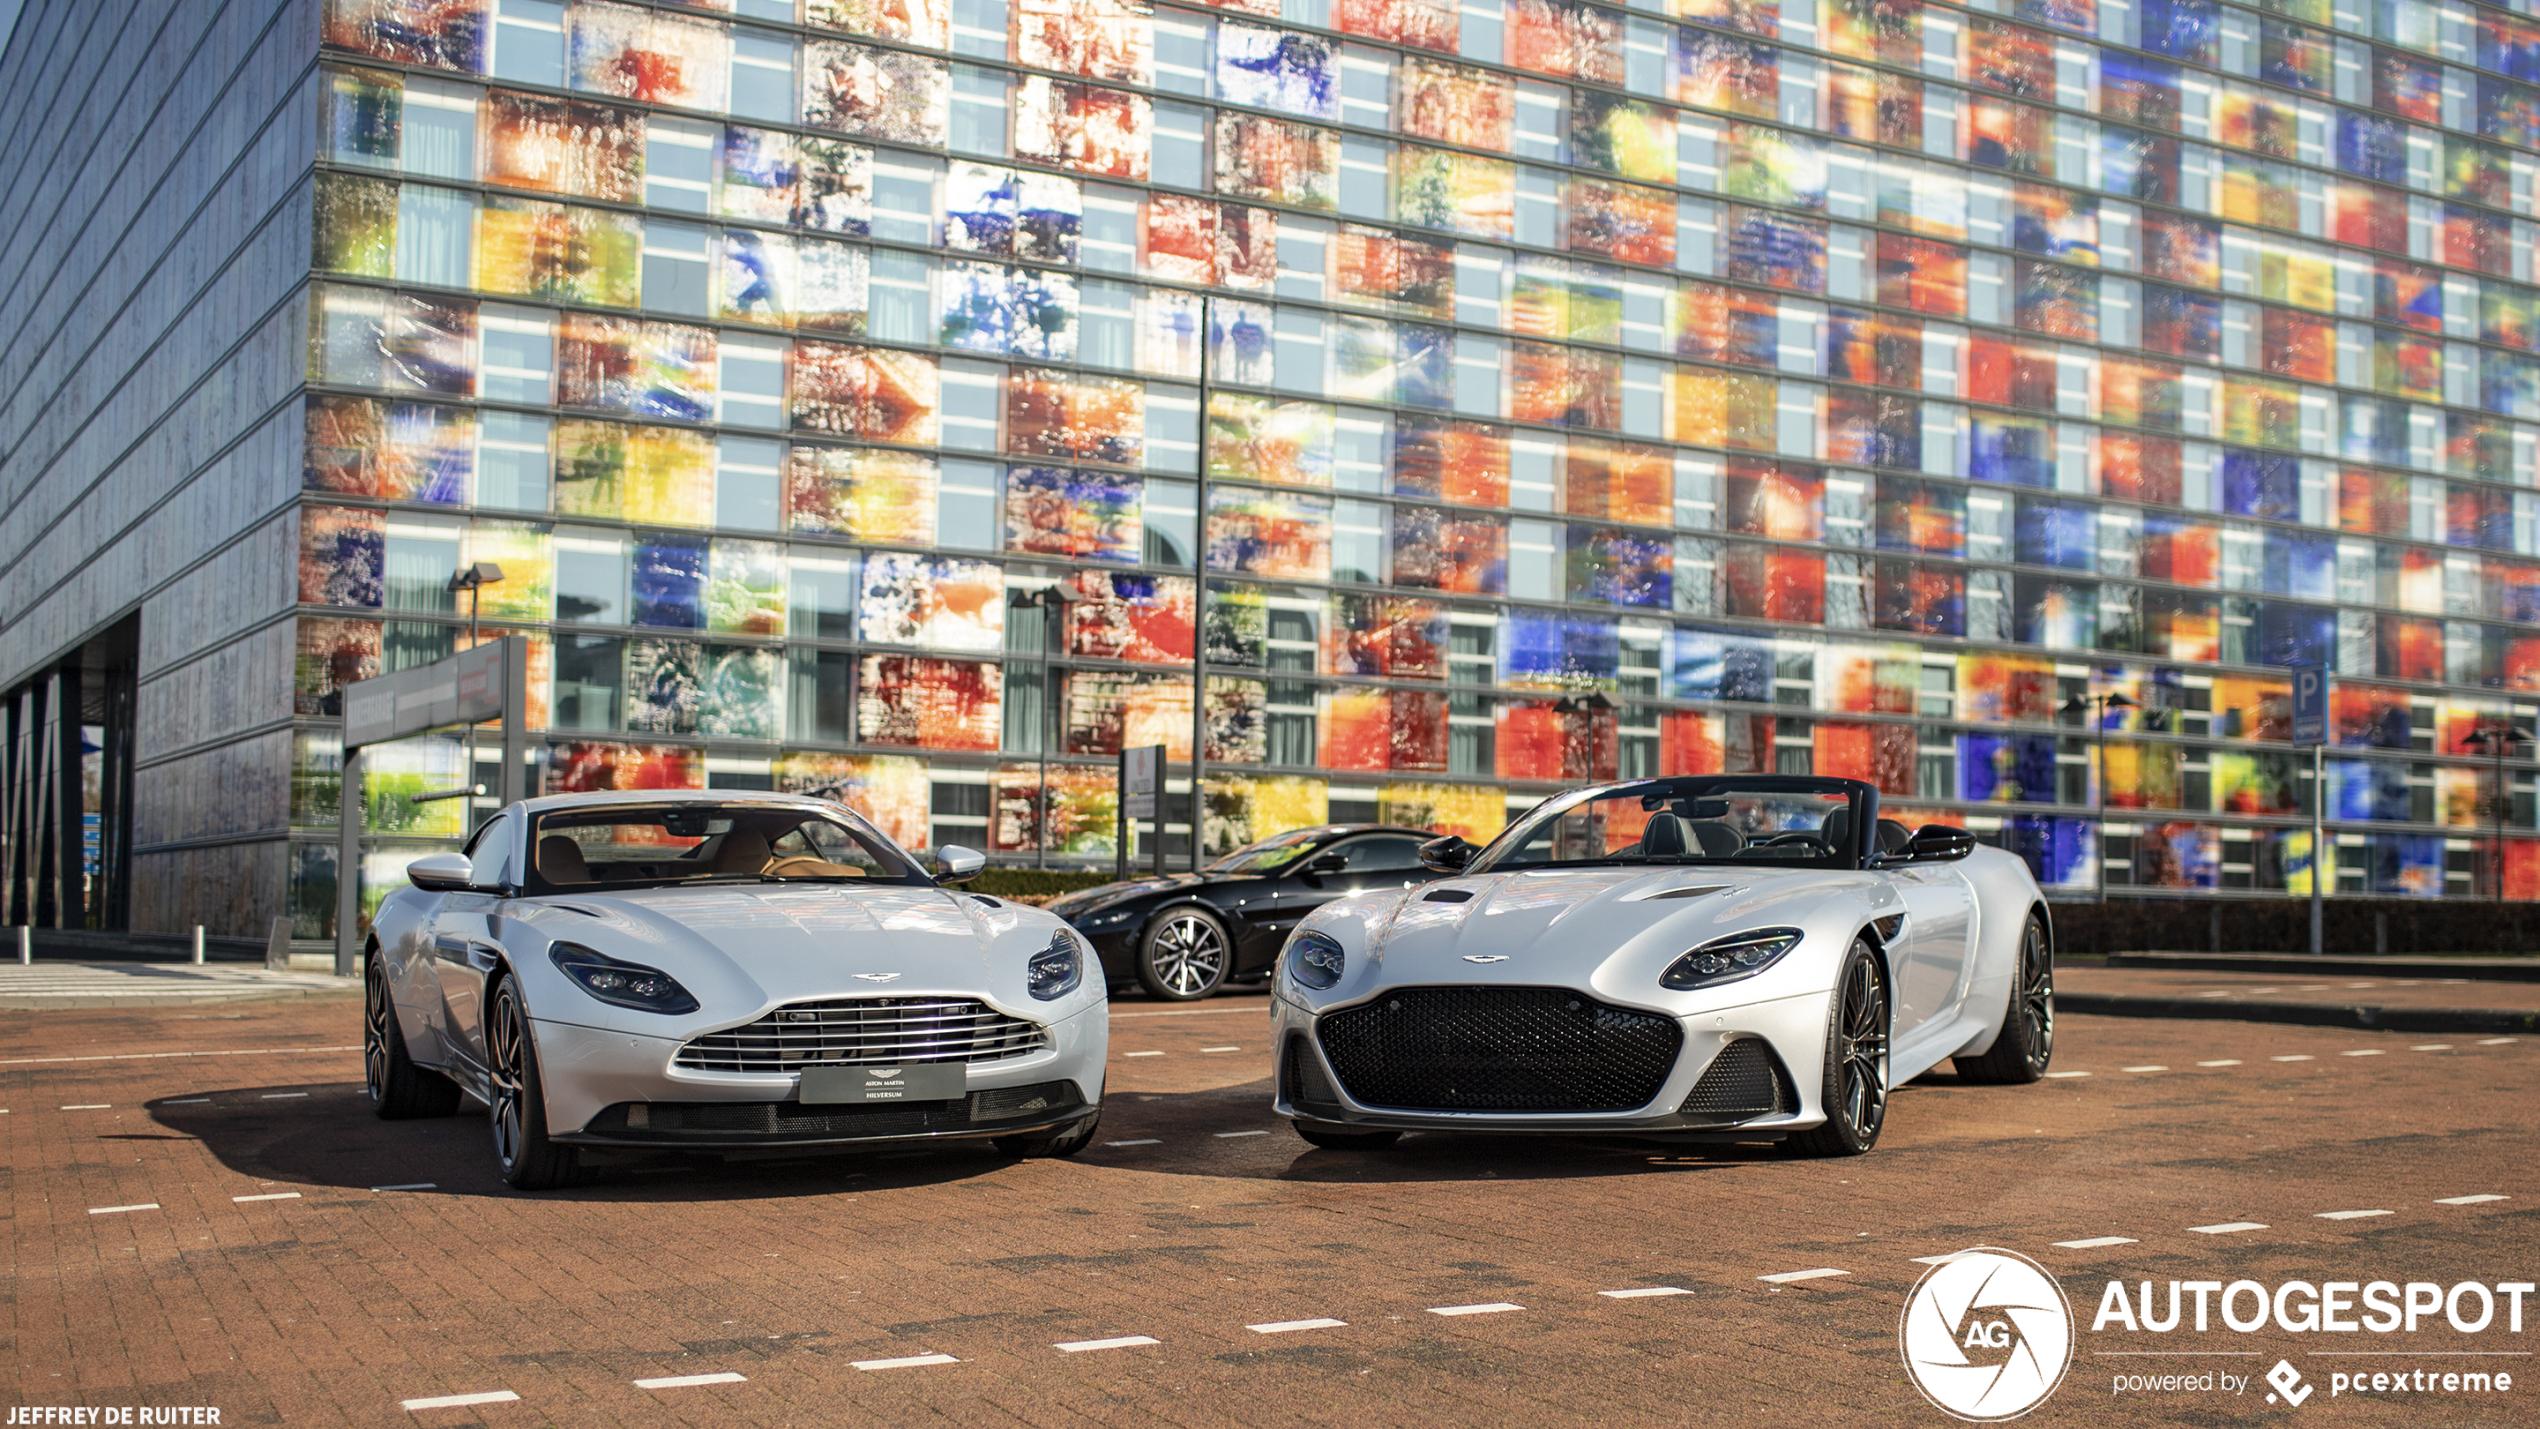 Aston Martin DBS Superleggera Volante pakt glansrijk de hoofdrol